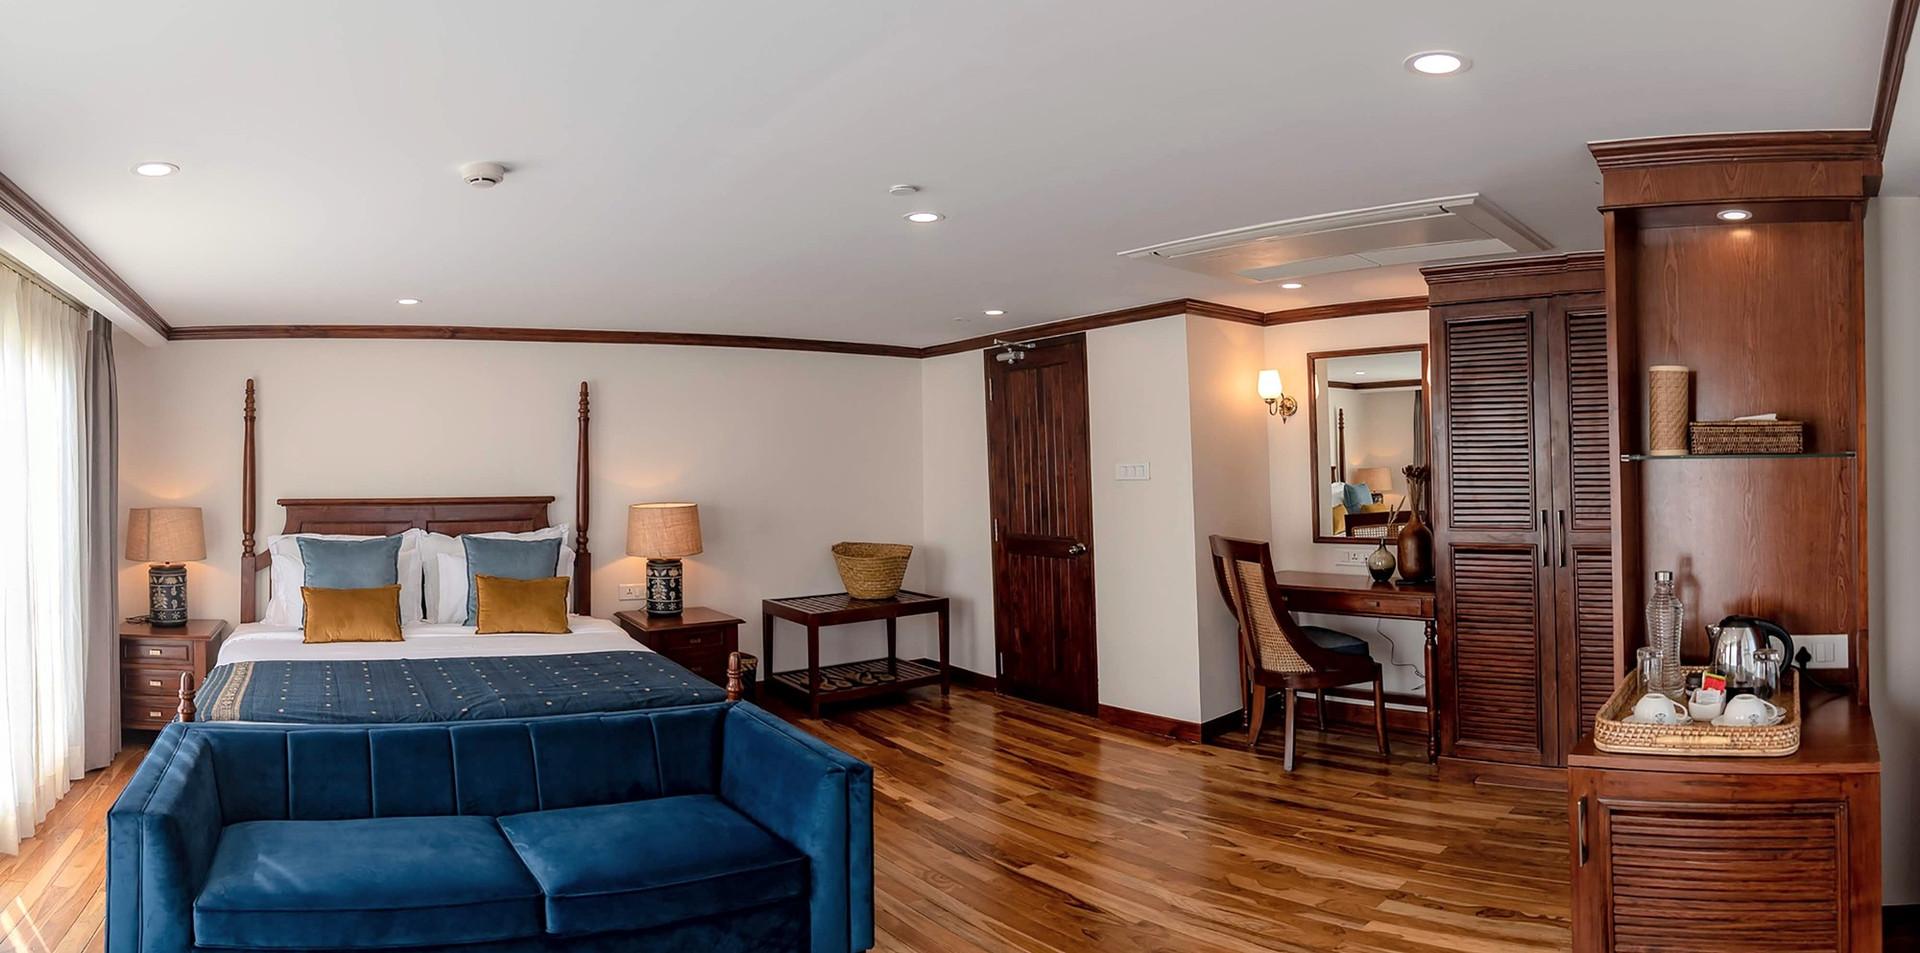 ABN Charaidew II deluxe cabin.jpg